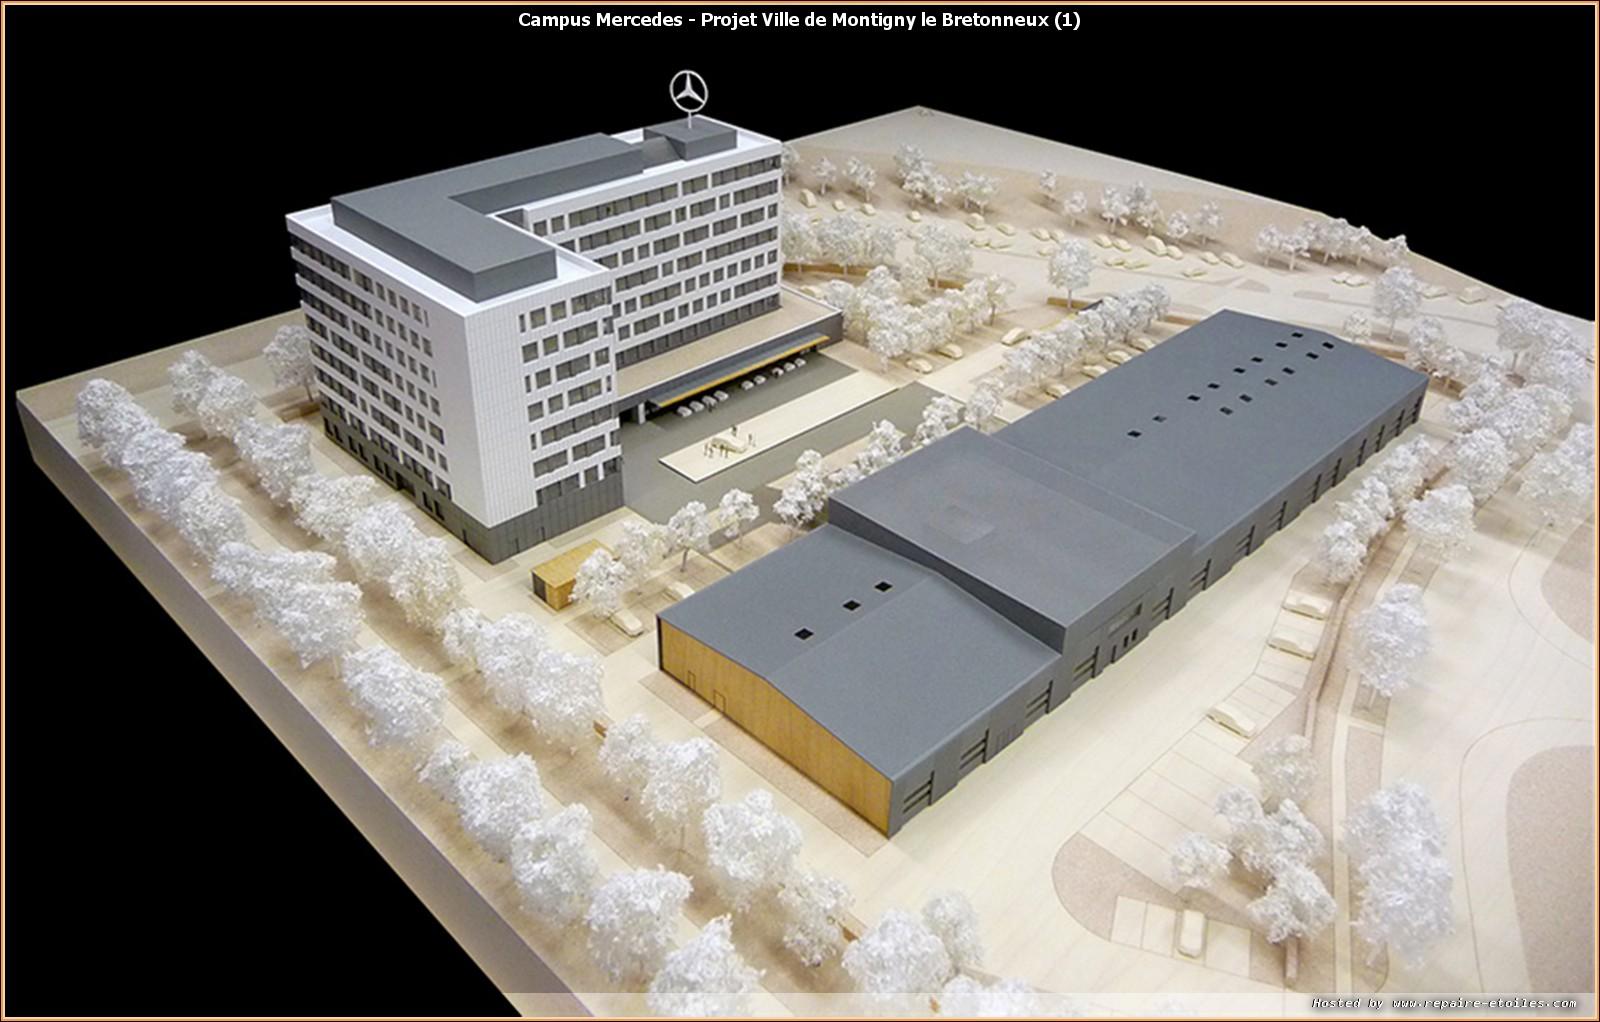 le futur campus mercedes benz france r alis par altarea cogedim. Black Bedroom Furniture Sets. Home Design Ideas